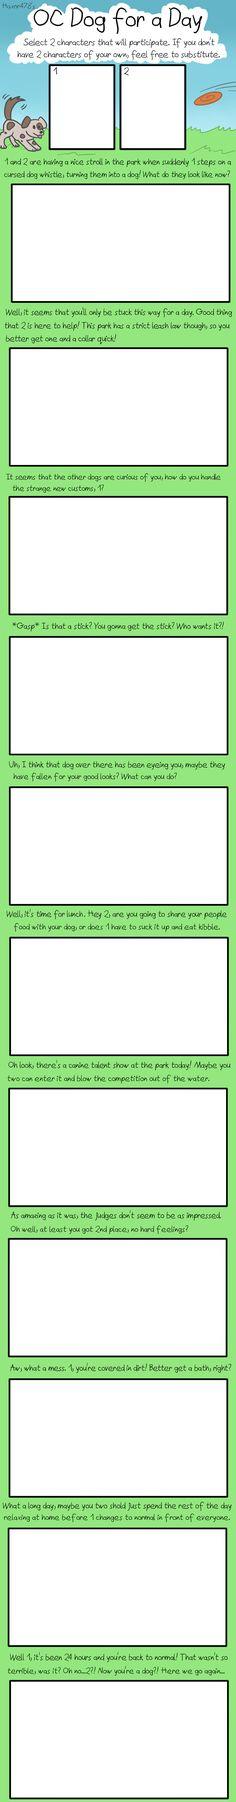 OC Dog for a Day: Blank Meme by haxor478.deviantart.com on @DeviantArt